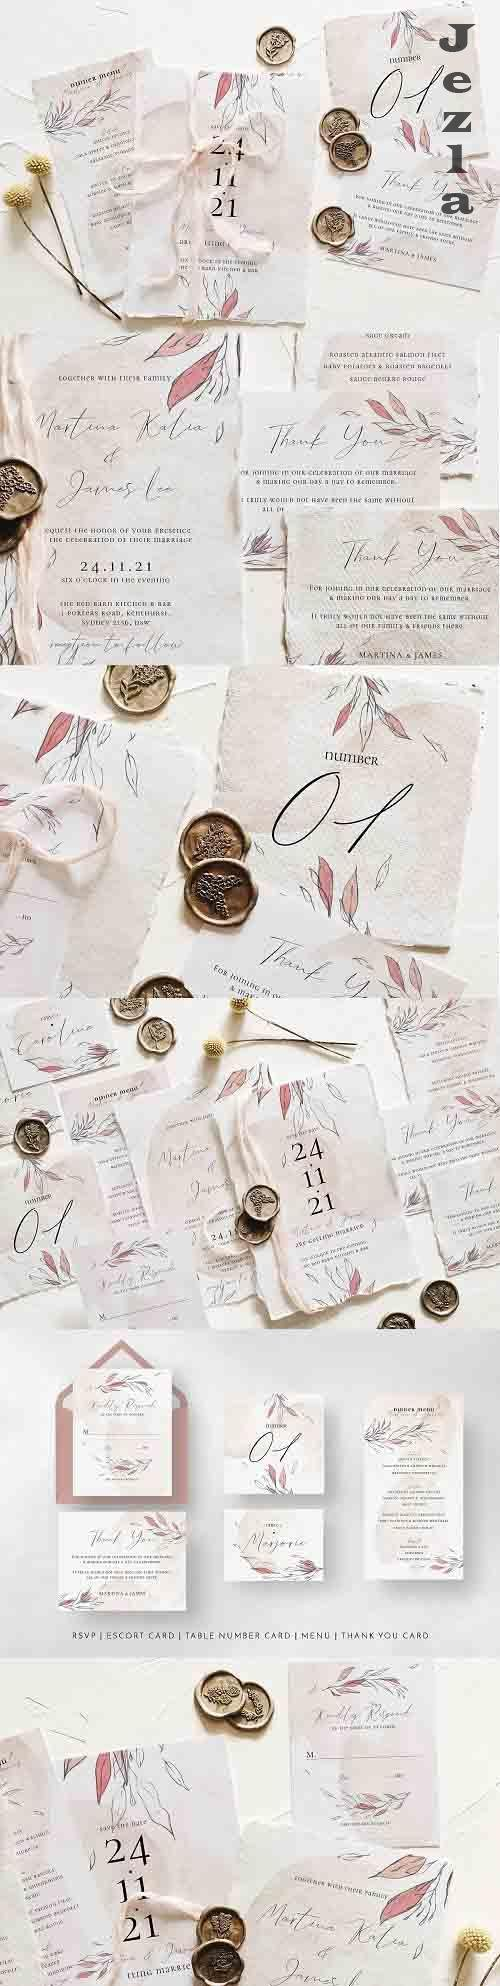 Blush & Foliage Wedding Suite - 5222915